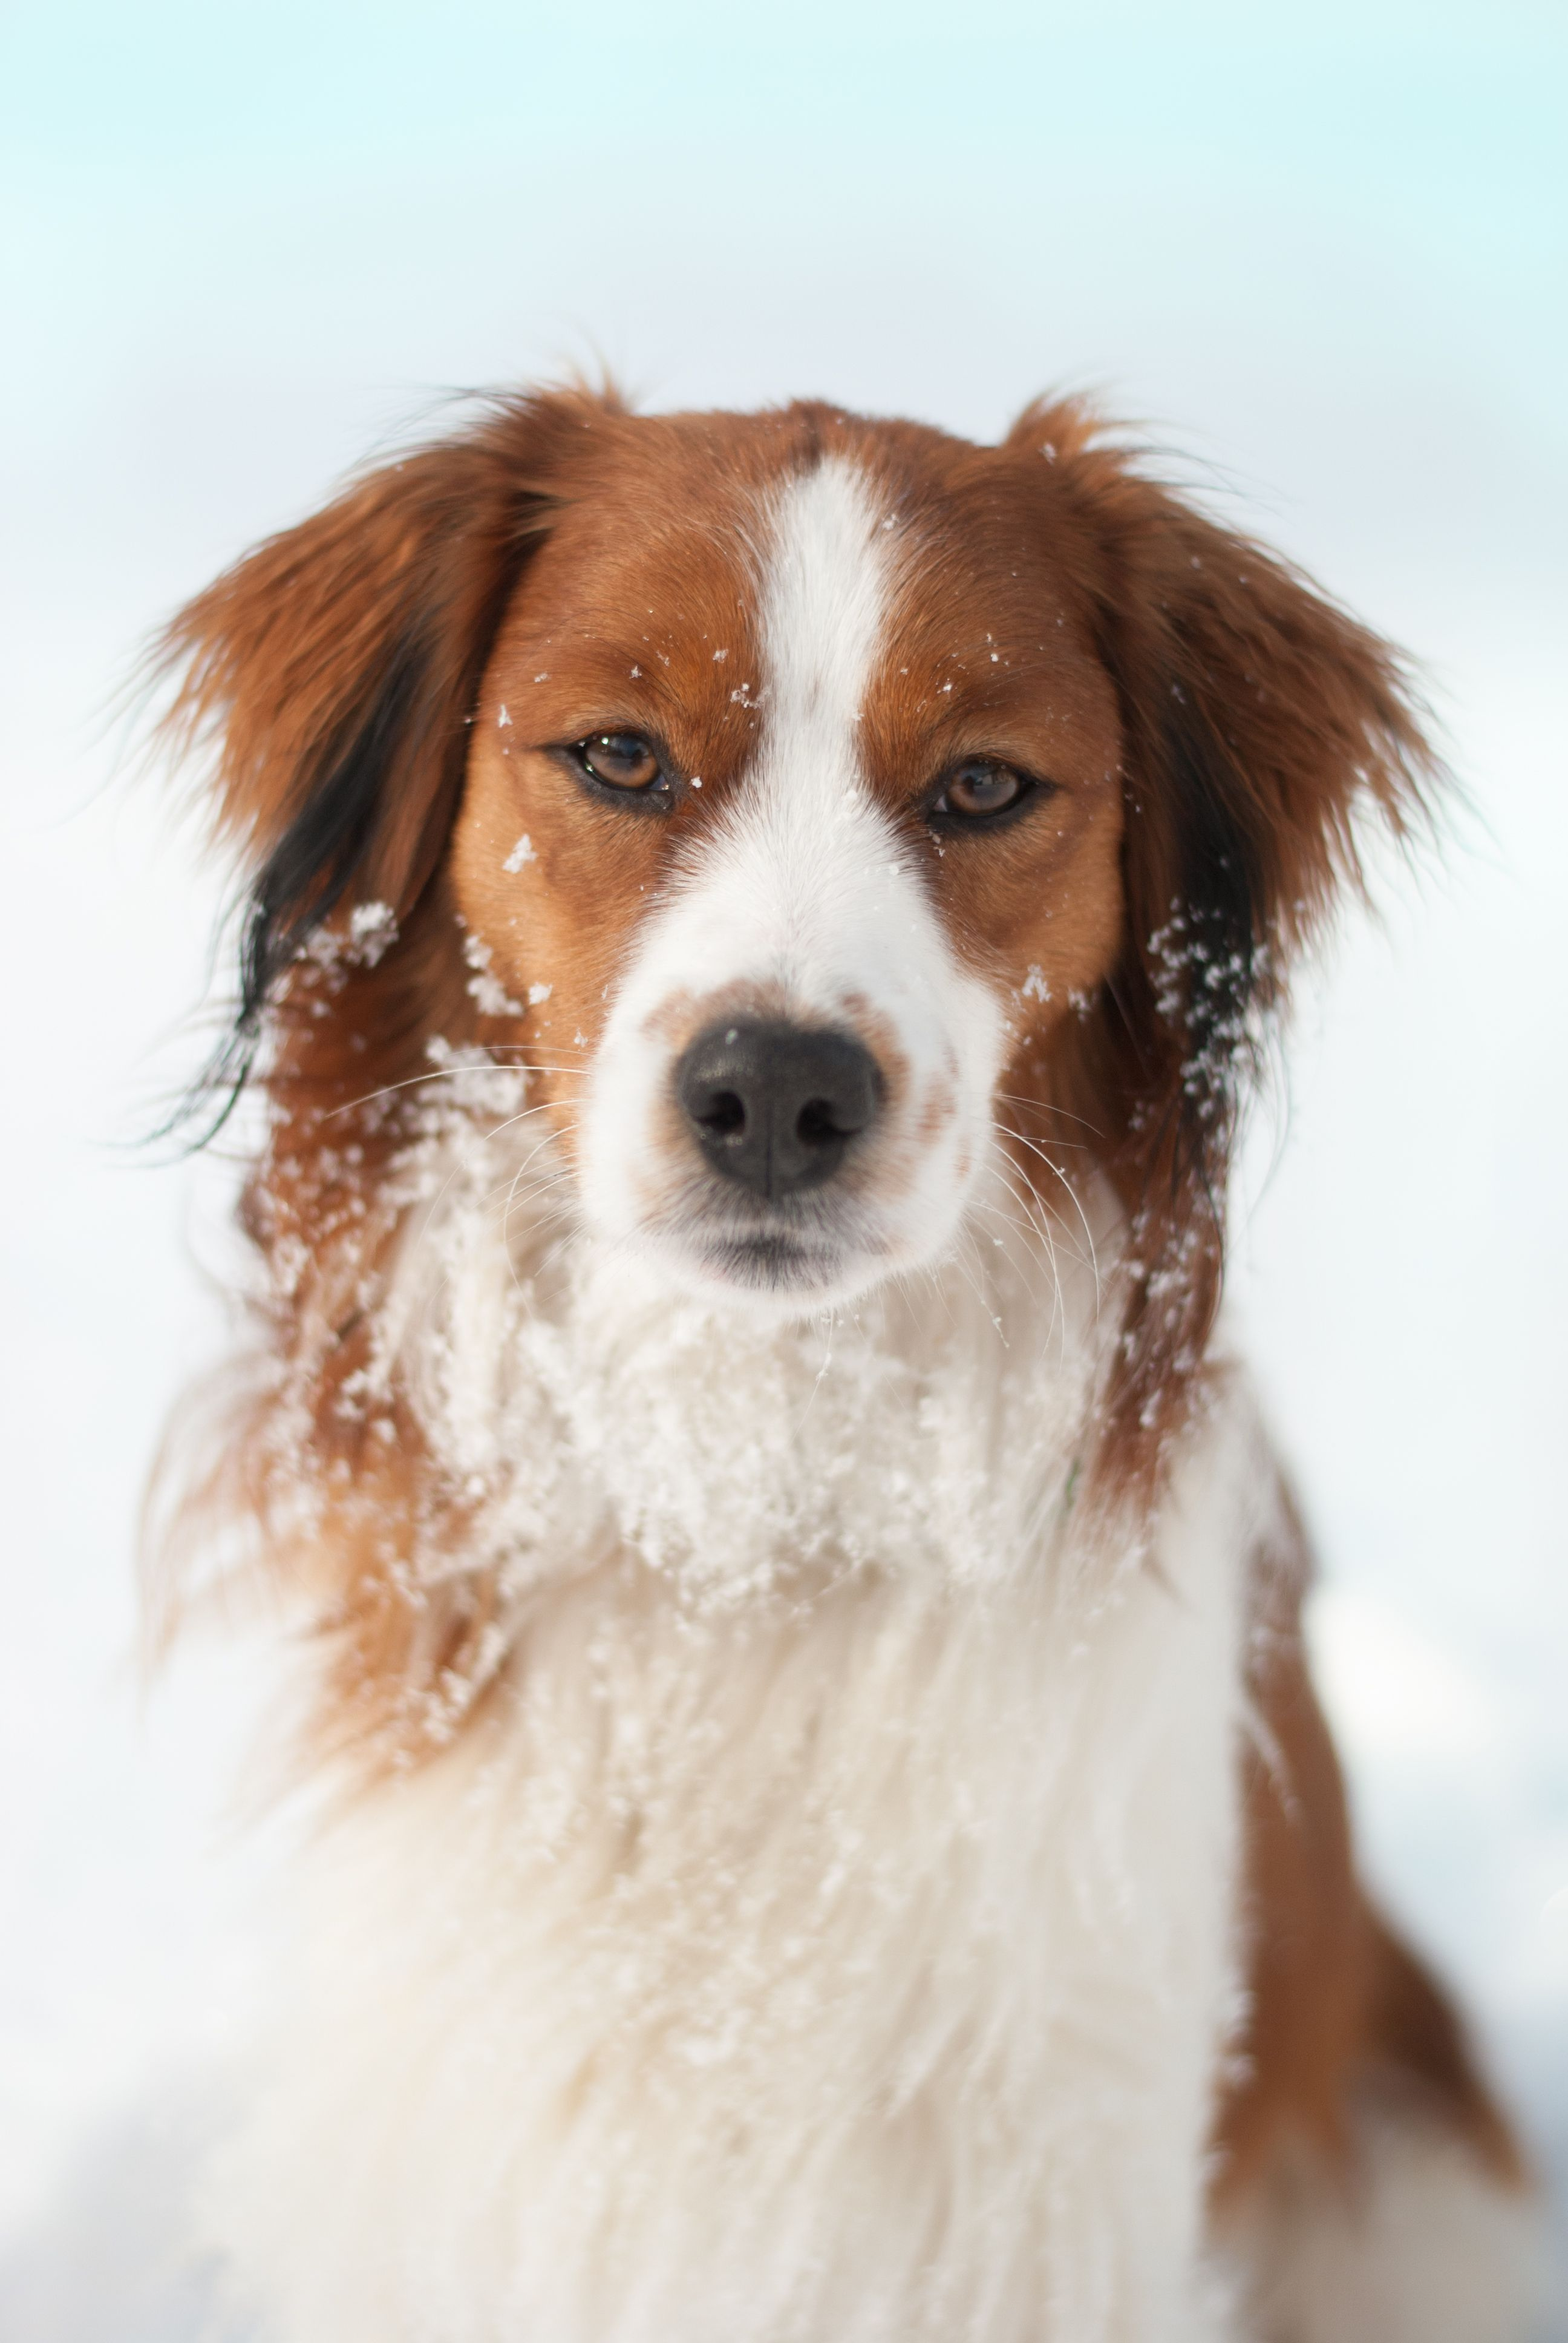 Kooikerhondje Campino 11 Months Old Hunderassen Hunde Kooikerhondje Welpen